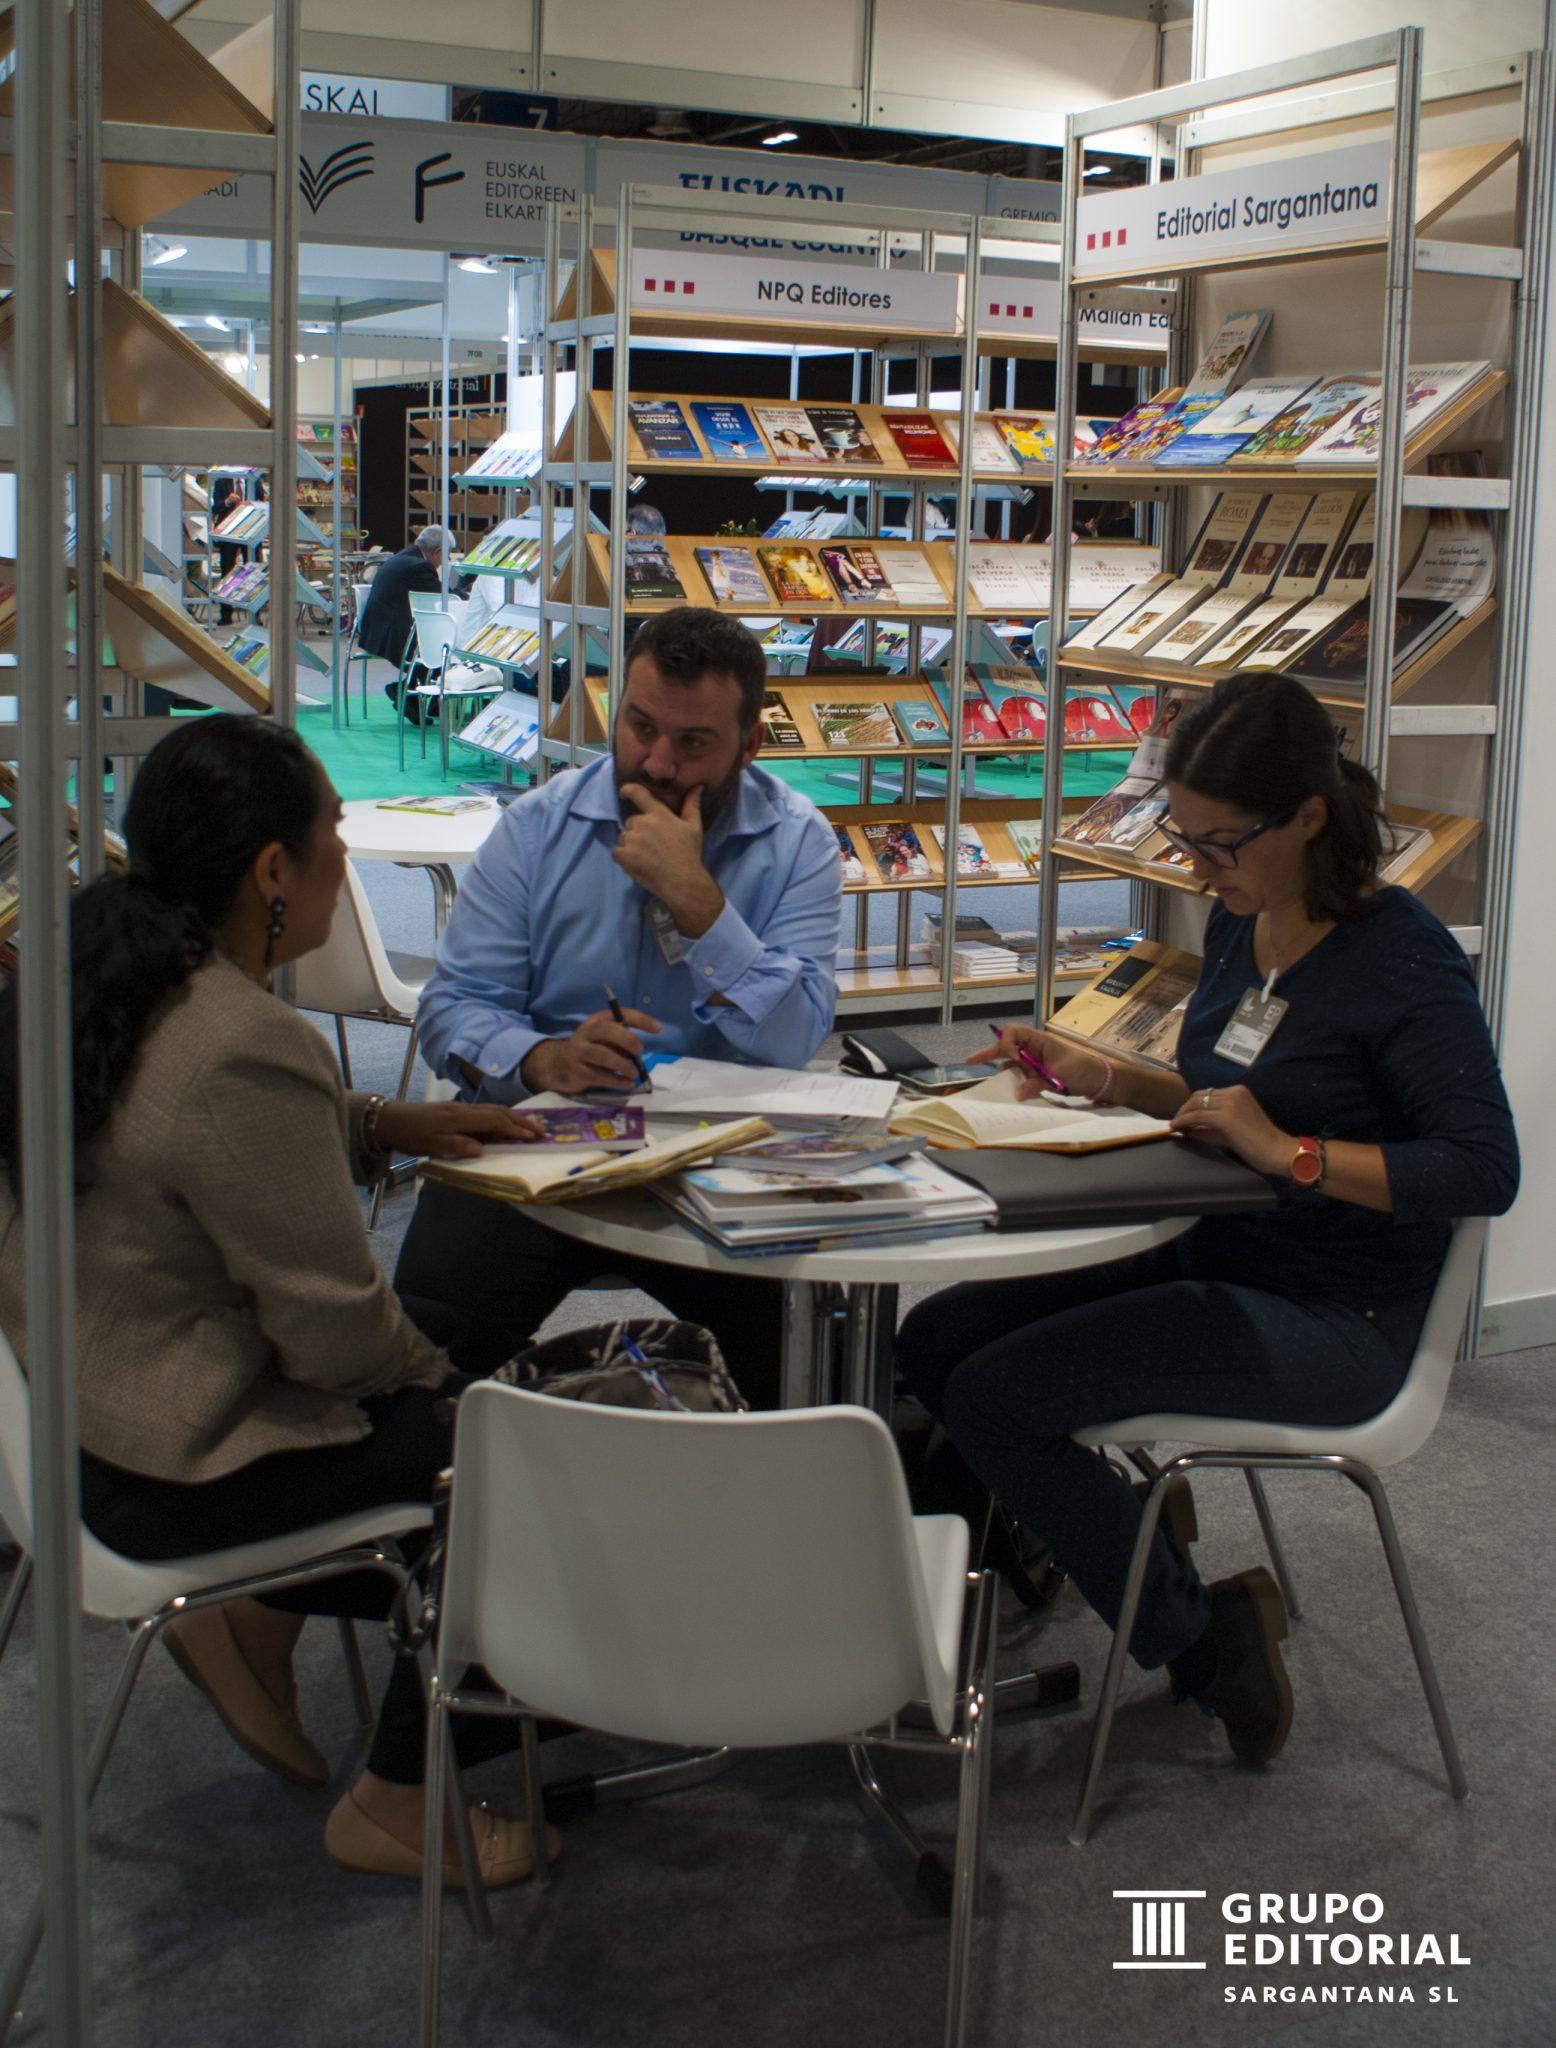 NPQ EDITORES PARTICIPA EN LA 37ª FERIA INTERNACIONAL DEL LIBRO (LIBER)